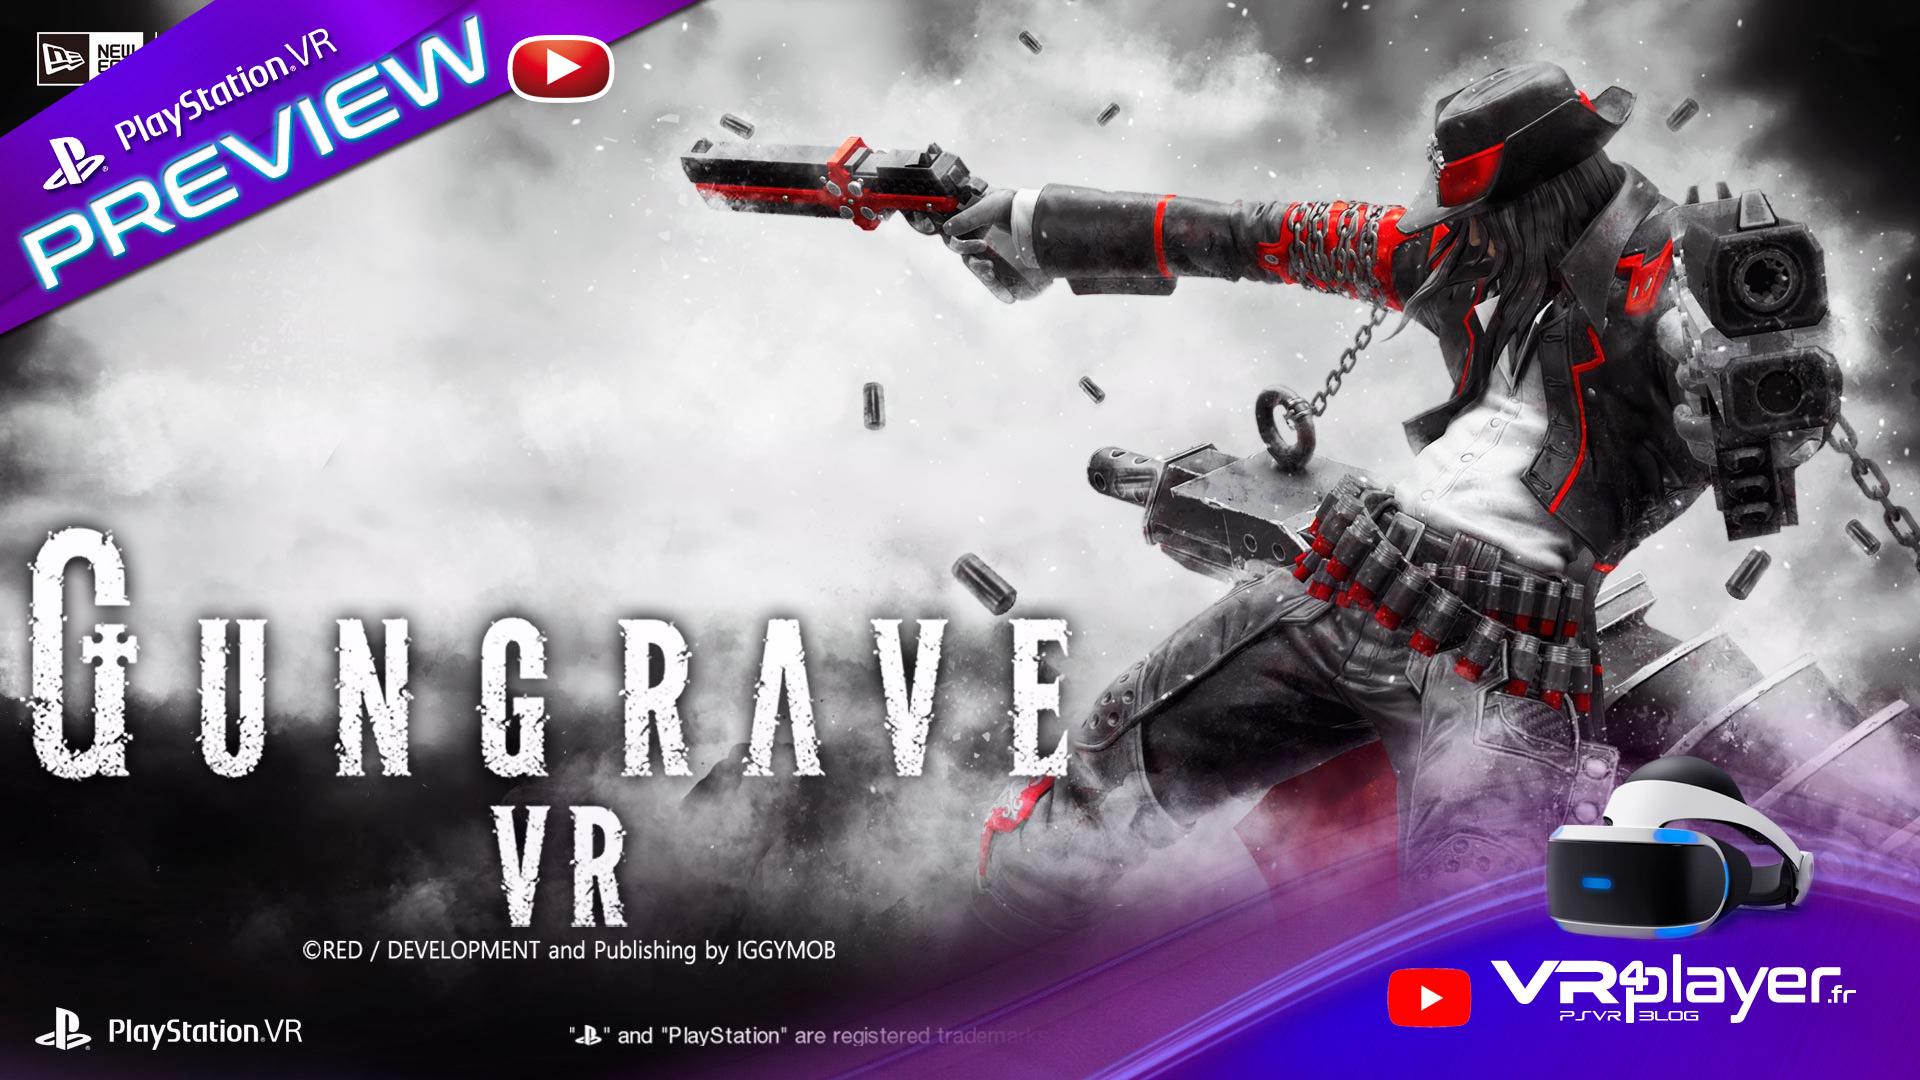 Gungrave VR, le test vr4player.fr sur PSVR